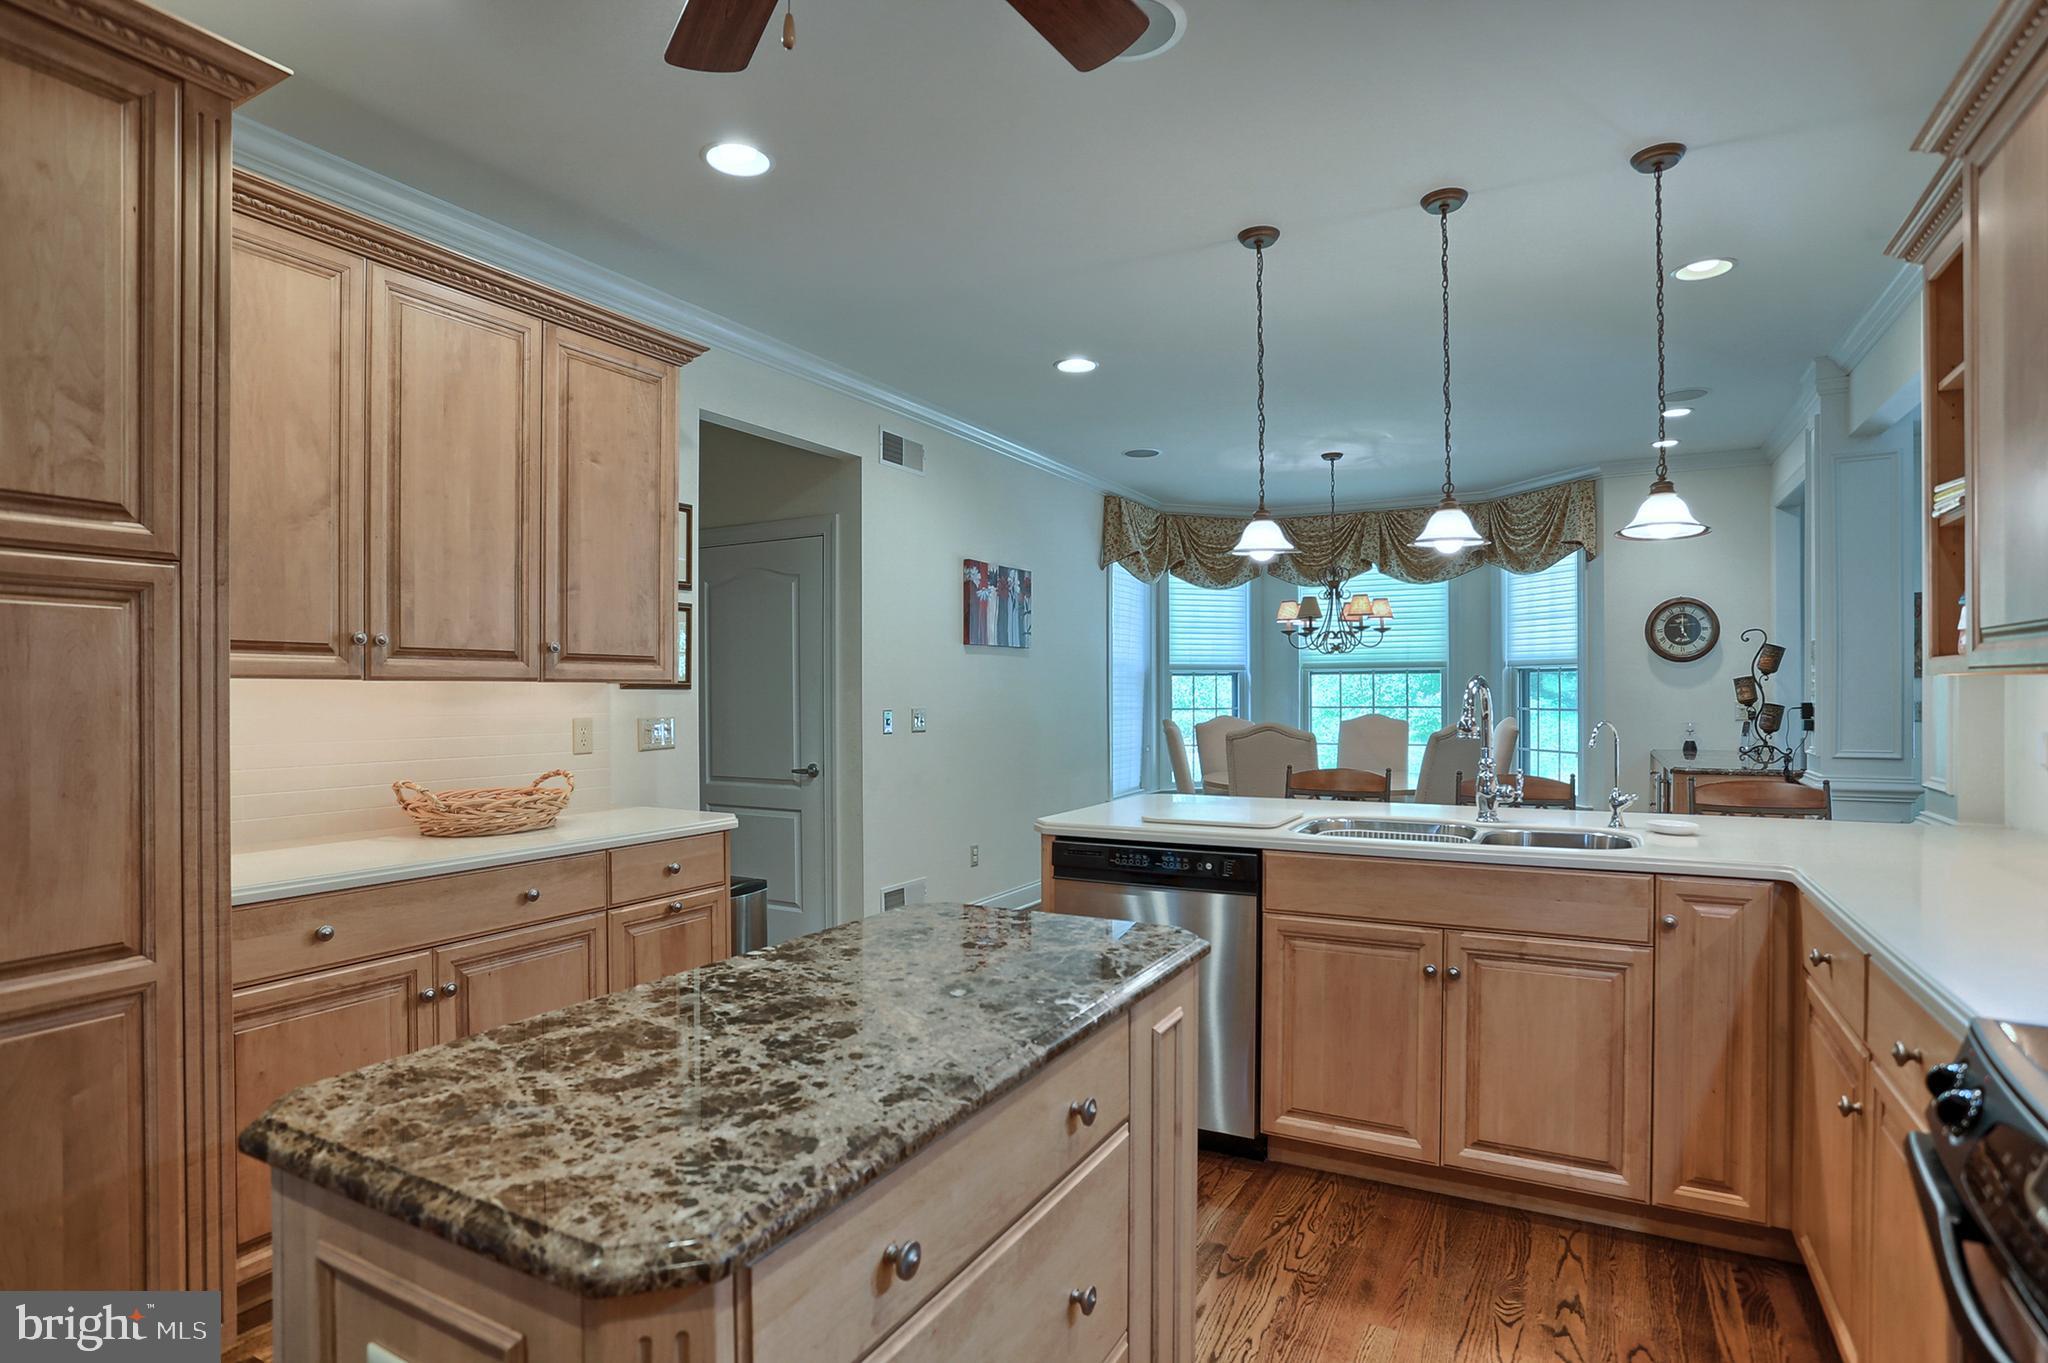 Another kitchen view toward breakfast area